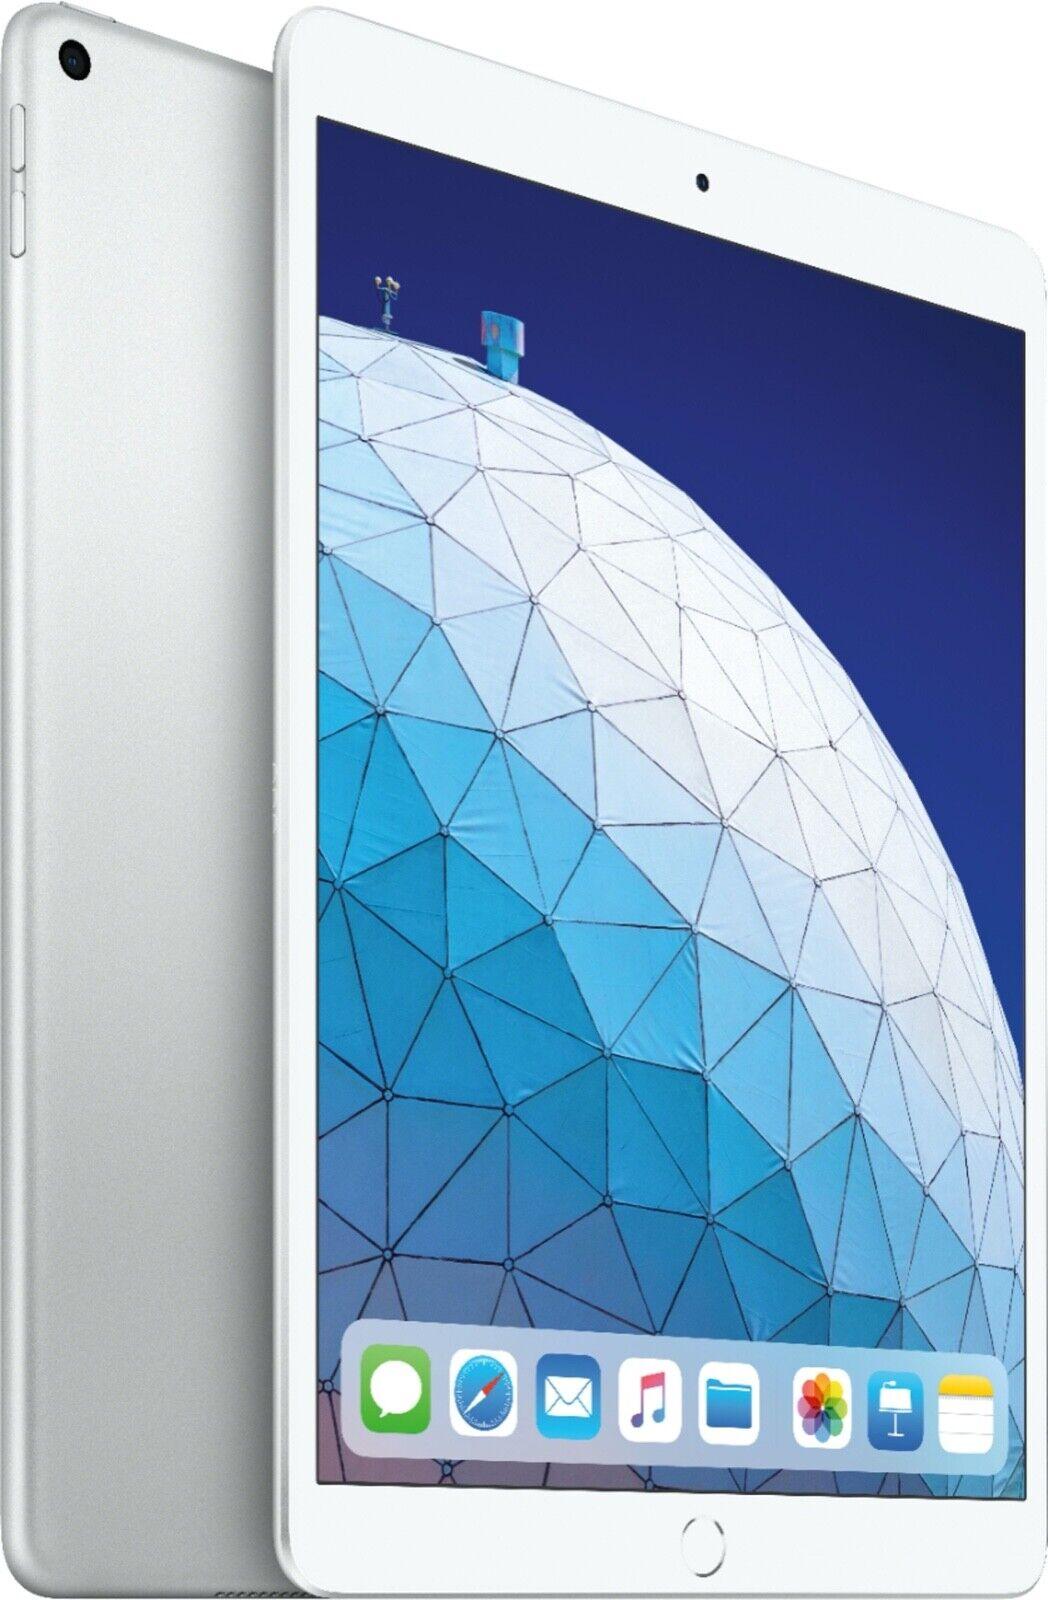 NEW Apple iPad Air 3rd Gen 256GB Wi-Fi 10.5in Silver MUUR2LL